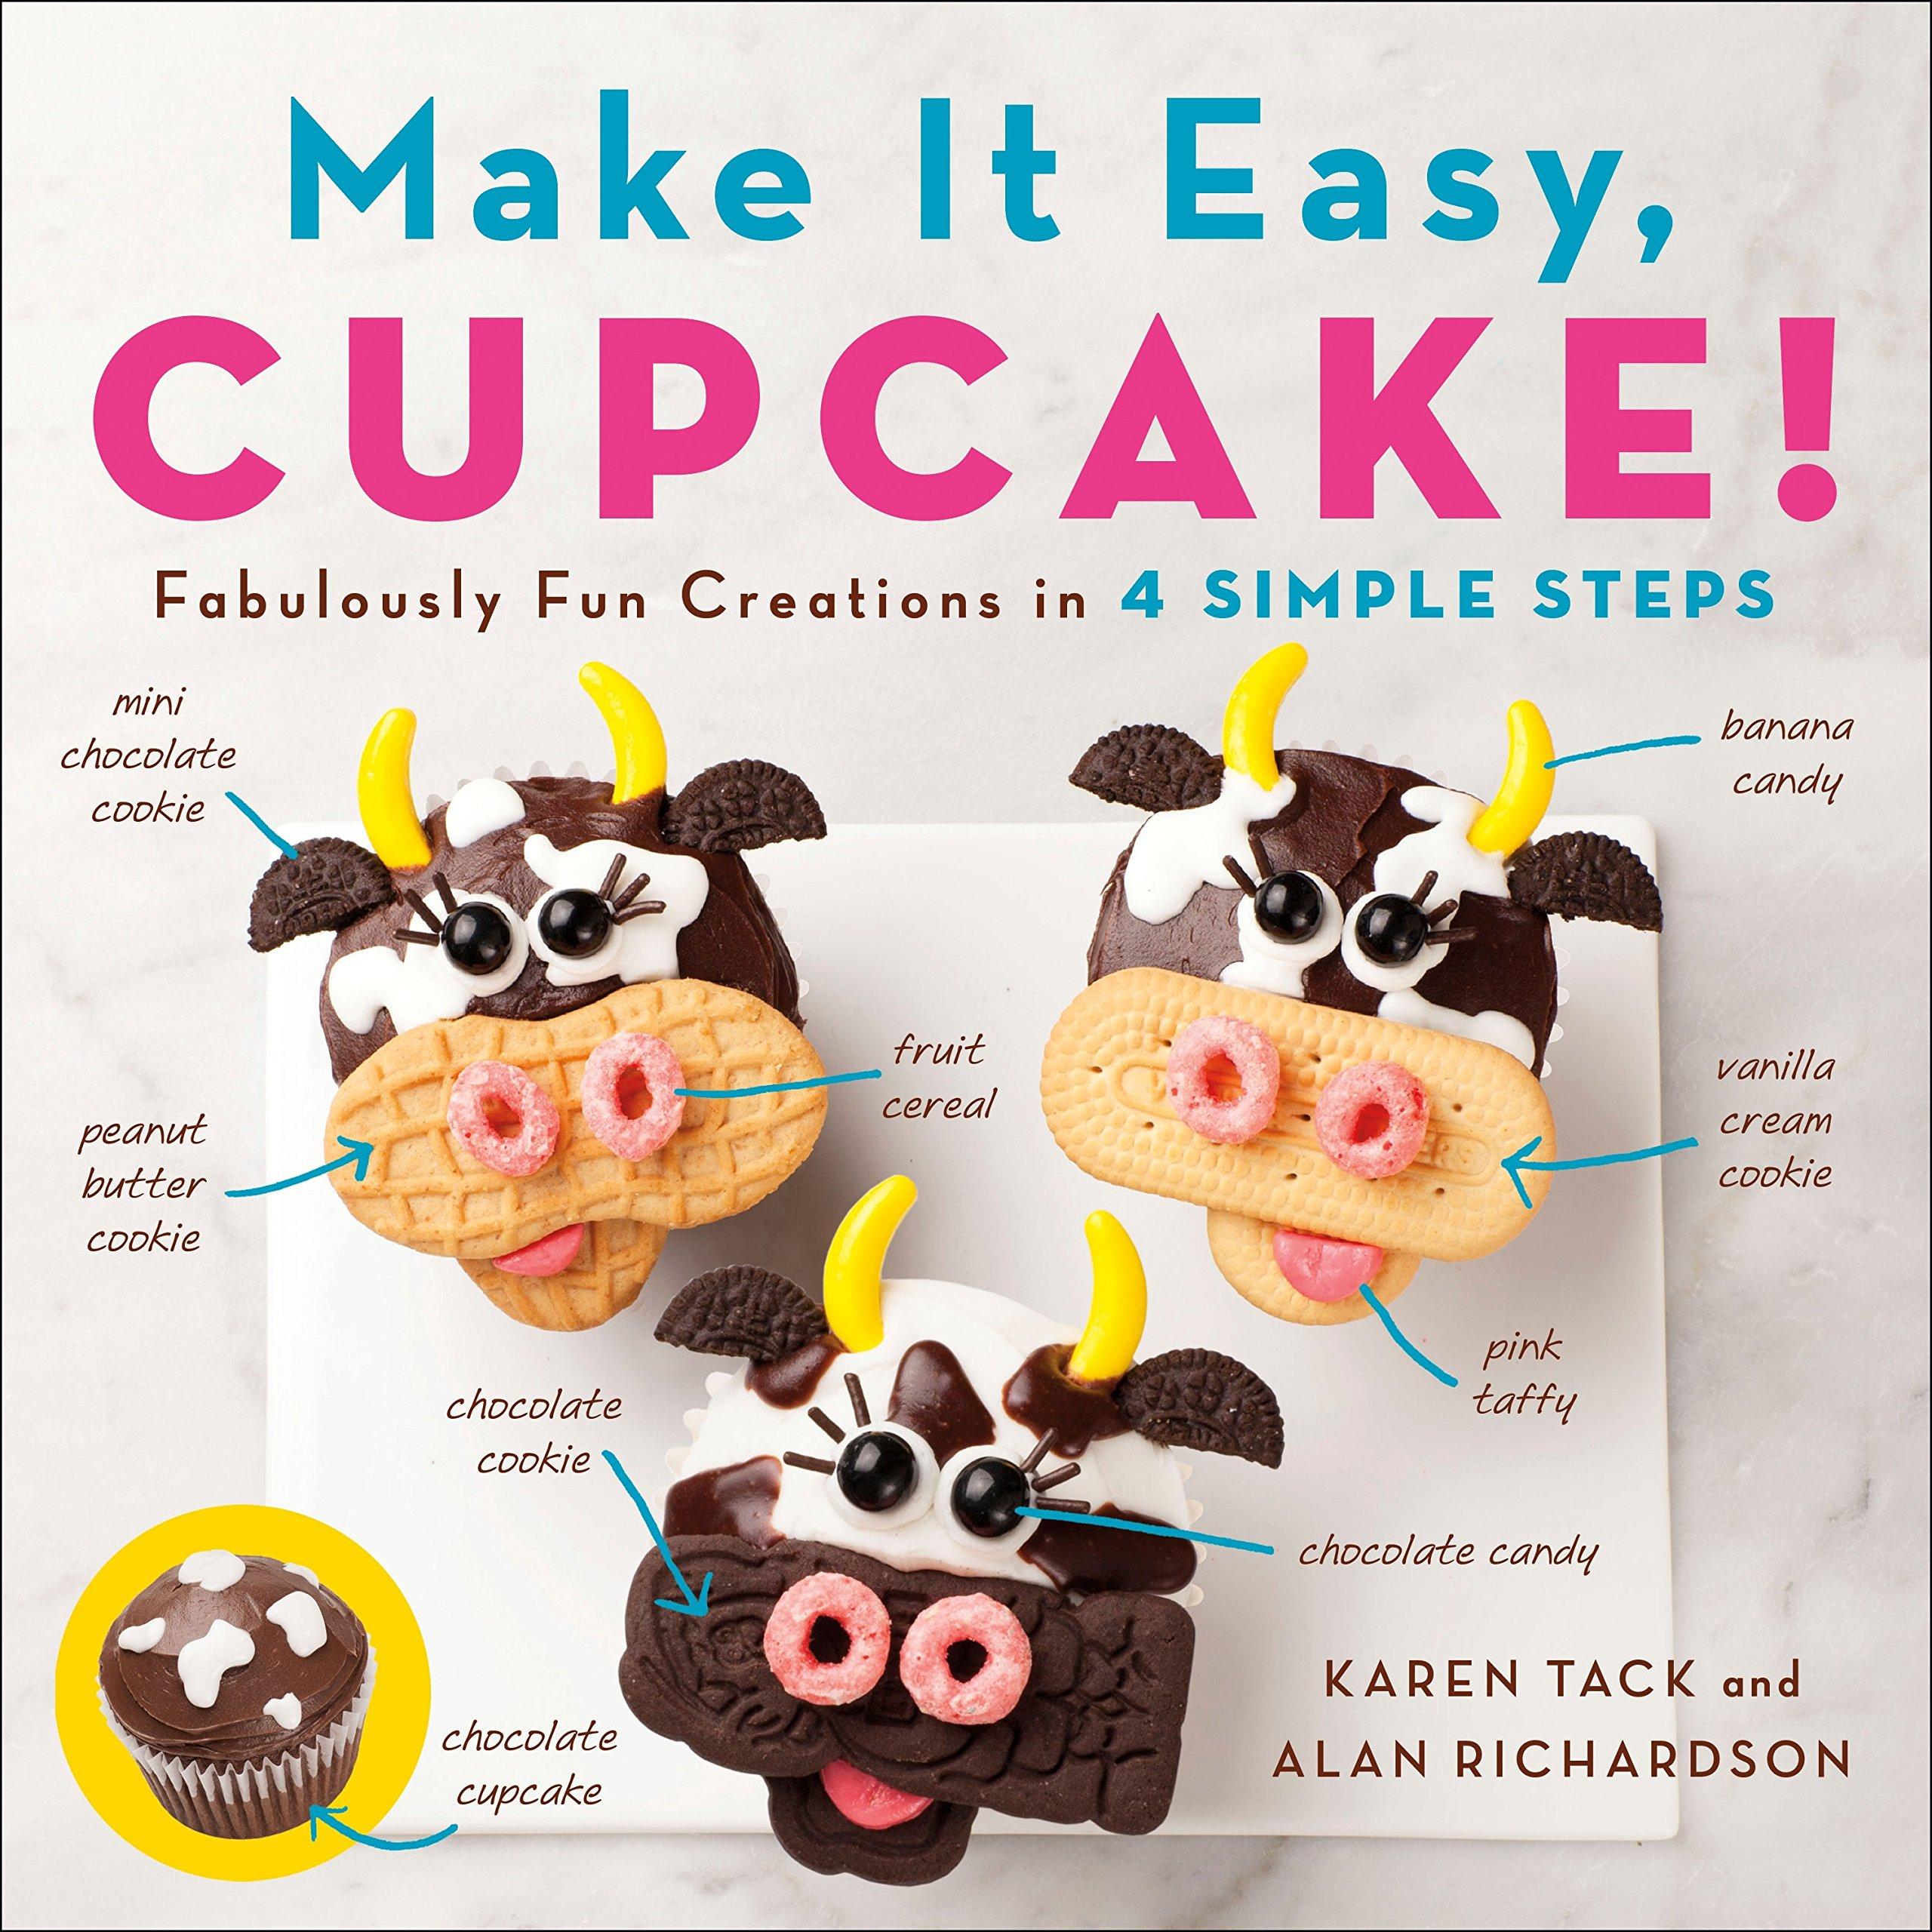 Make It Easy, Cupcake!: Fabulously Fun Creations in 4 Simple Steps: Alan  Richardson, Karen Tack: 9781250139399: Amazon.com: Books